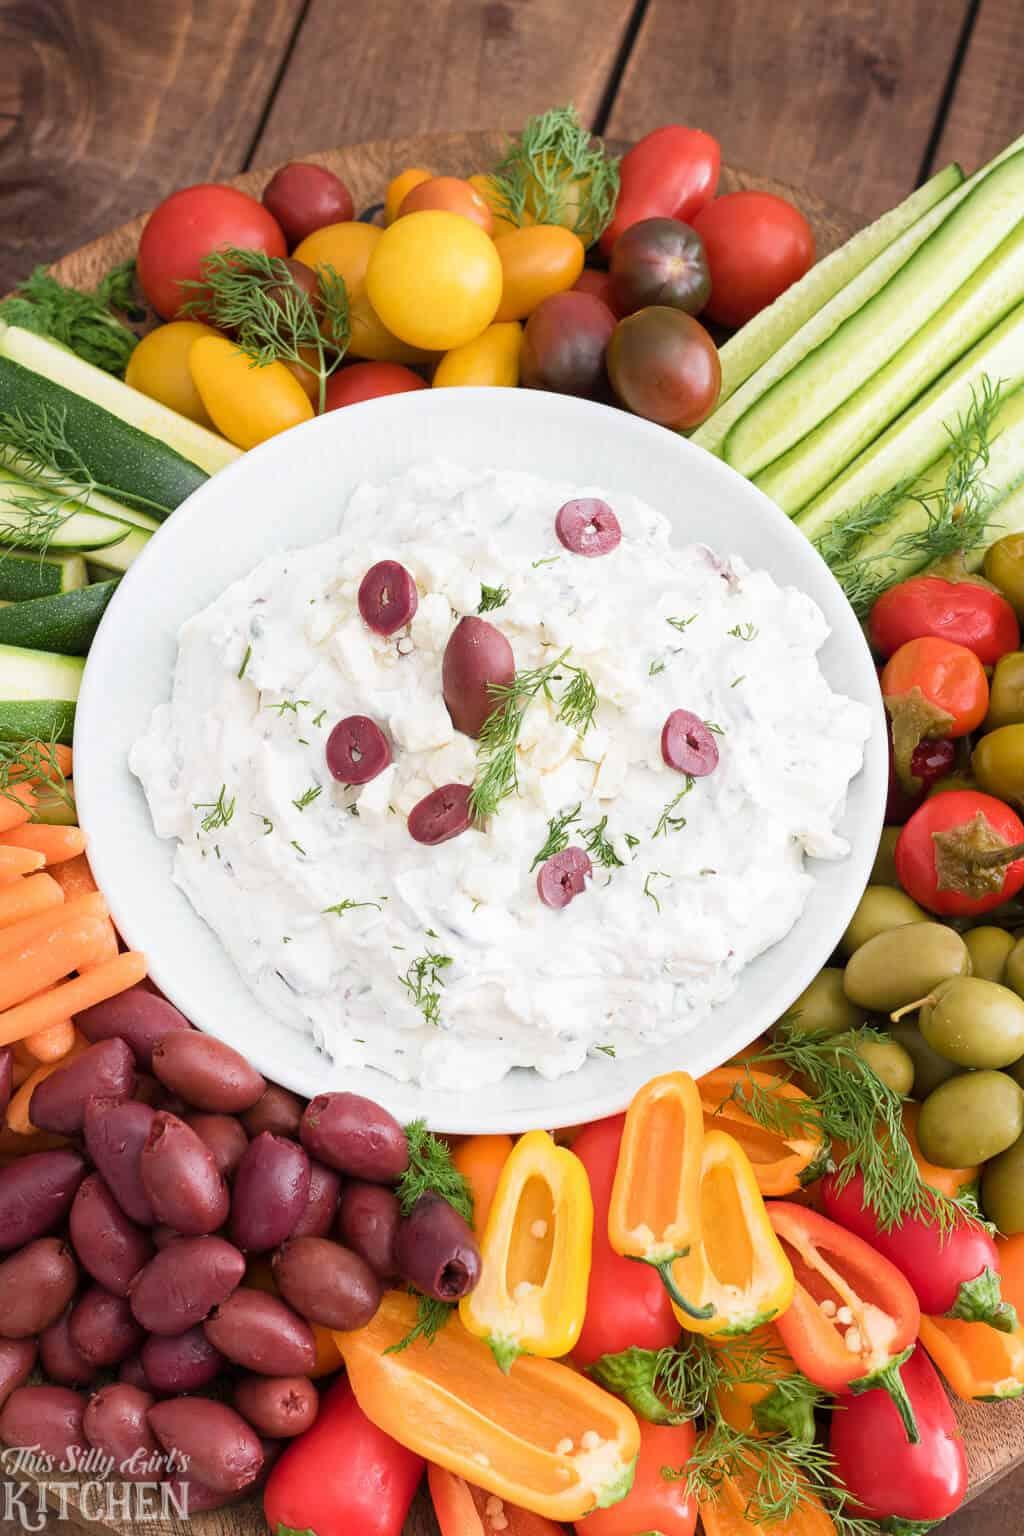 Greek Yogurt Dip, a creamy crowd-pleasing yogurt dip, loaded with traditional Greek flavors! #recipe from ThisSillyGirlsKitchen.com #greekyogurtdip #easy #greekyogurtdipforveggies